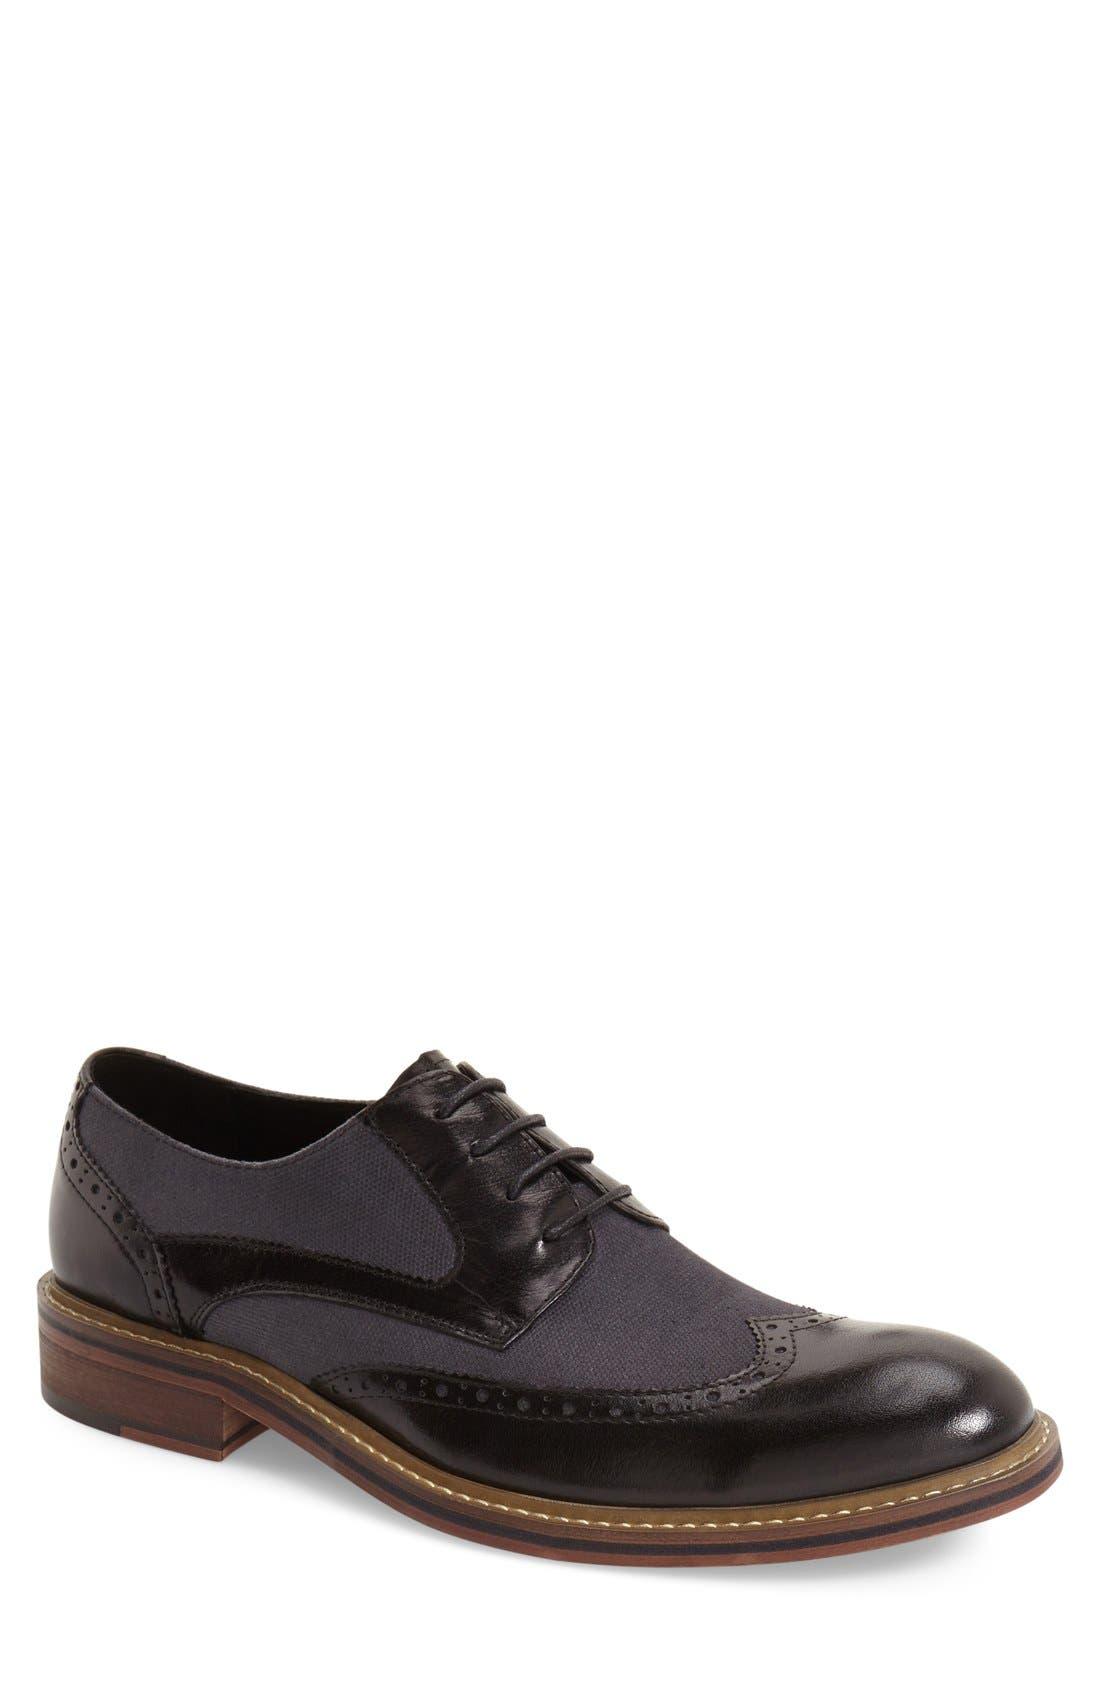 'Money' Spectator Shoe,                         Main,                         color, BLACK LEATHER